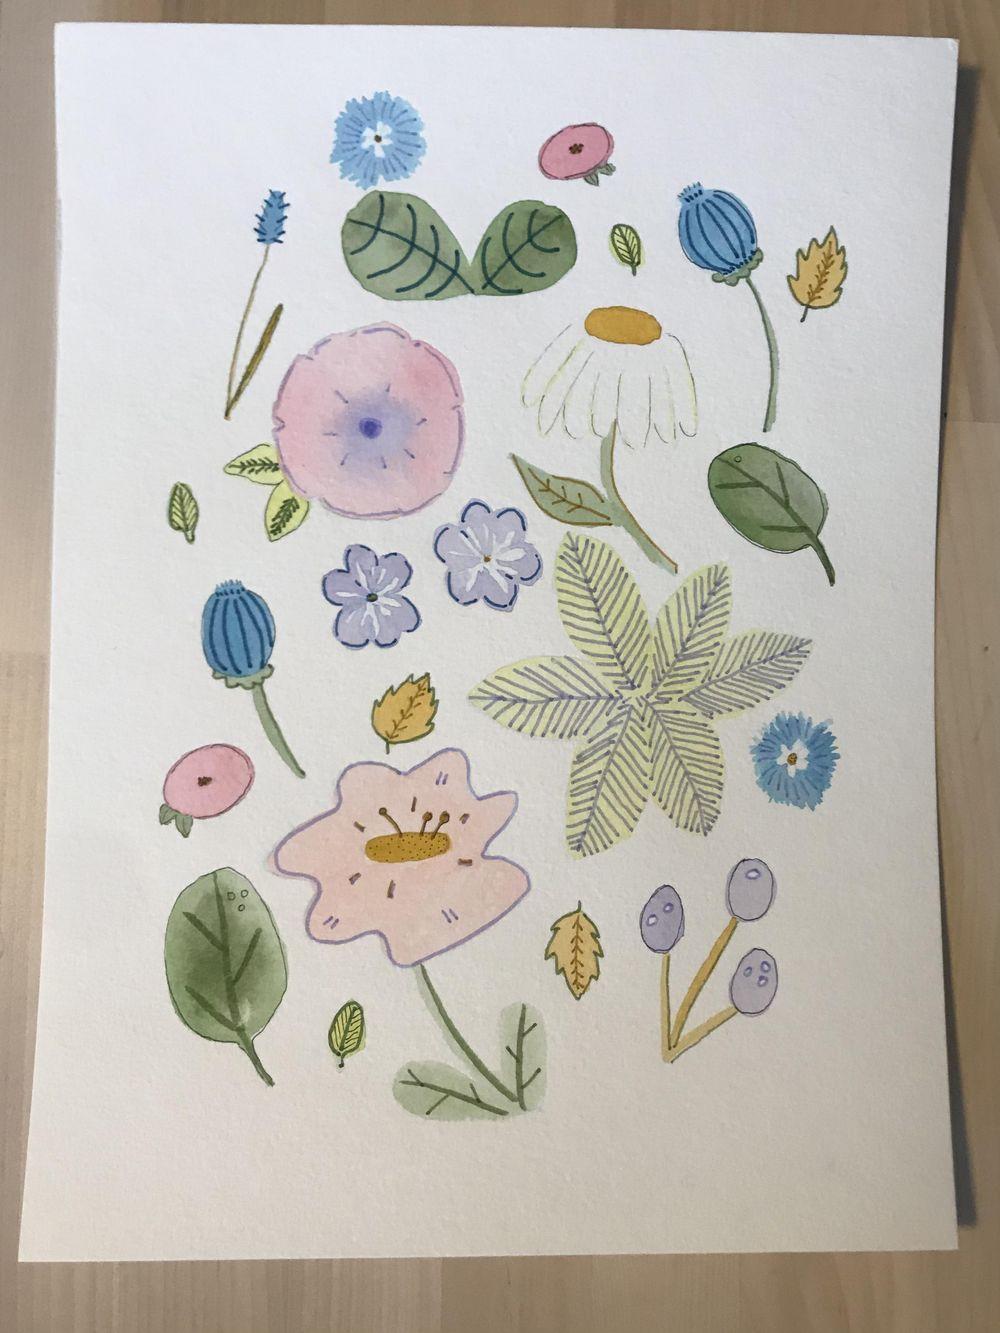 Brush Pen Florals! - image 1 - student project